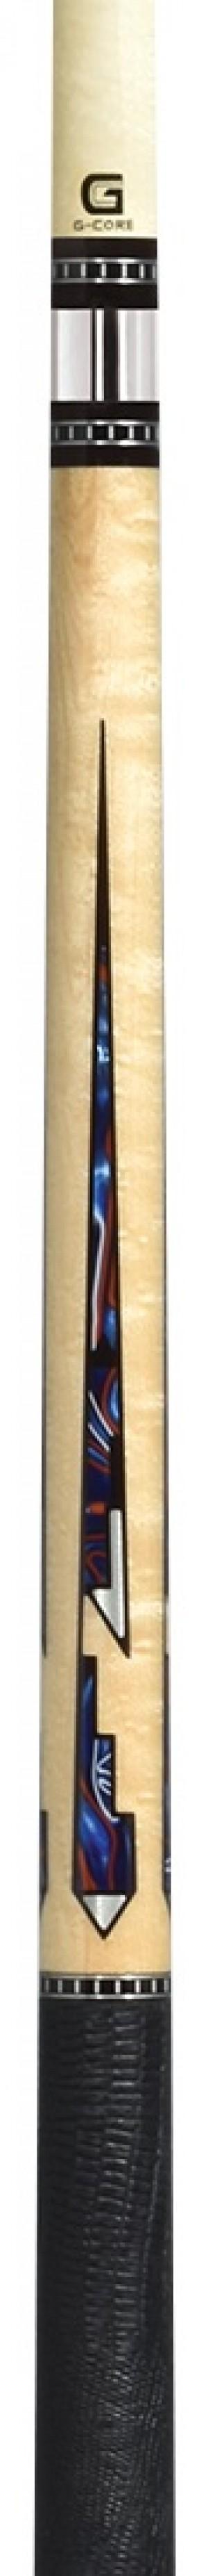 McDermott G-Series Cue G609